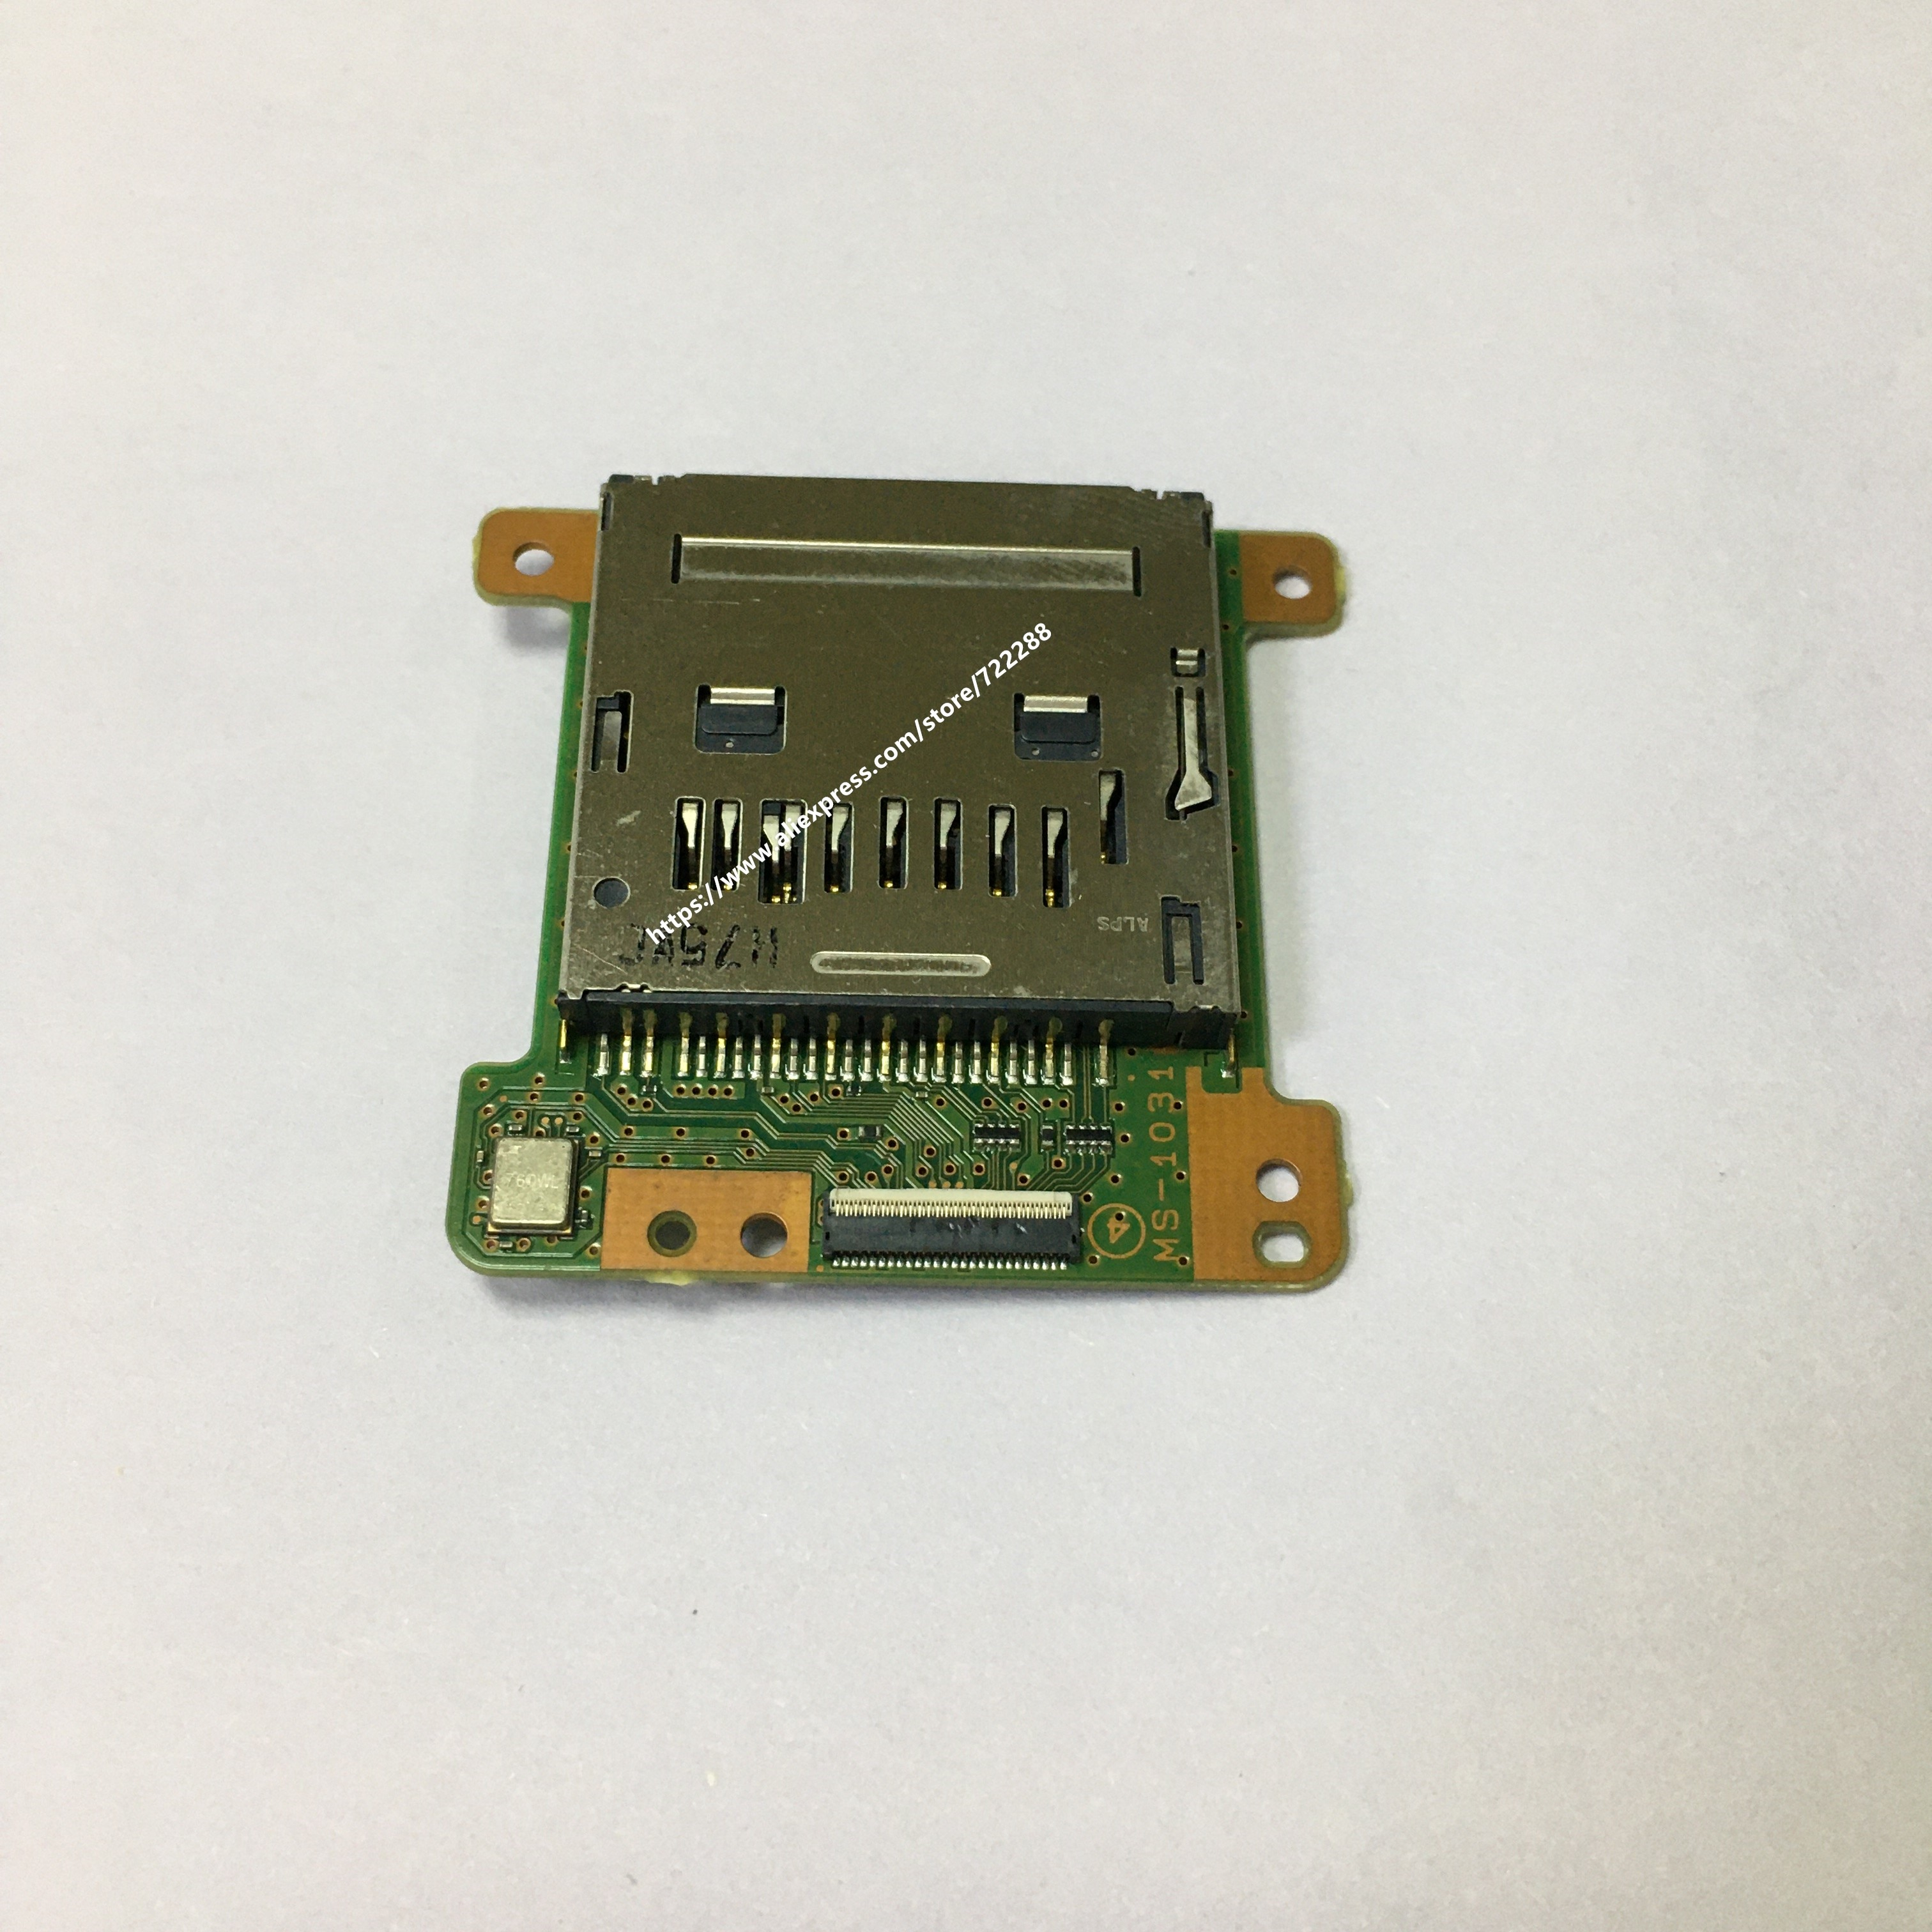 Piezas de repuesto para Sony FDR-AX40 FDR-AX53 SD Tarjeta de cemento ranura MS-1031 A-2103-902-A de montaje